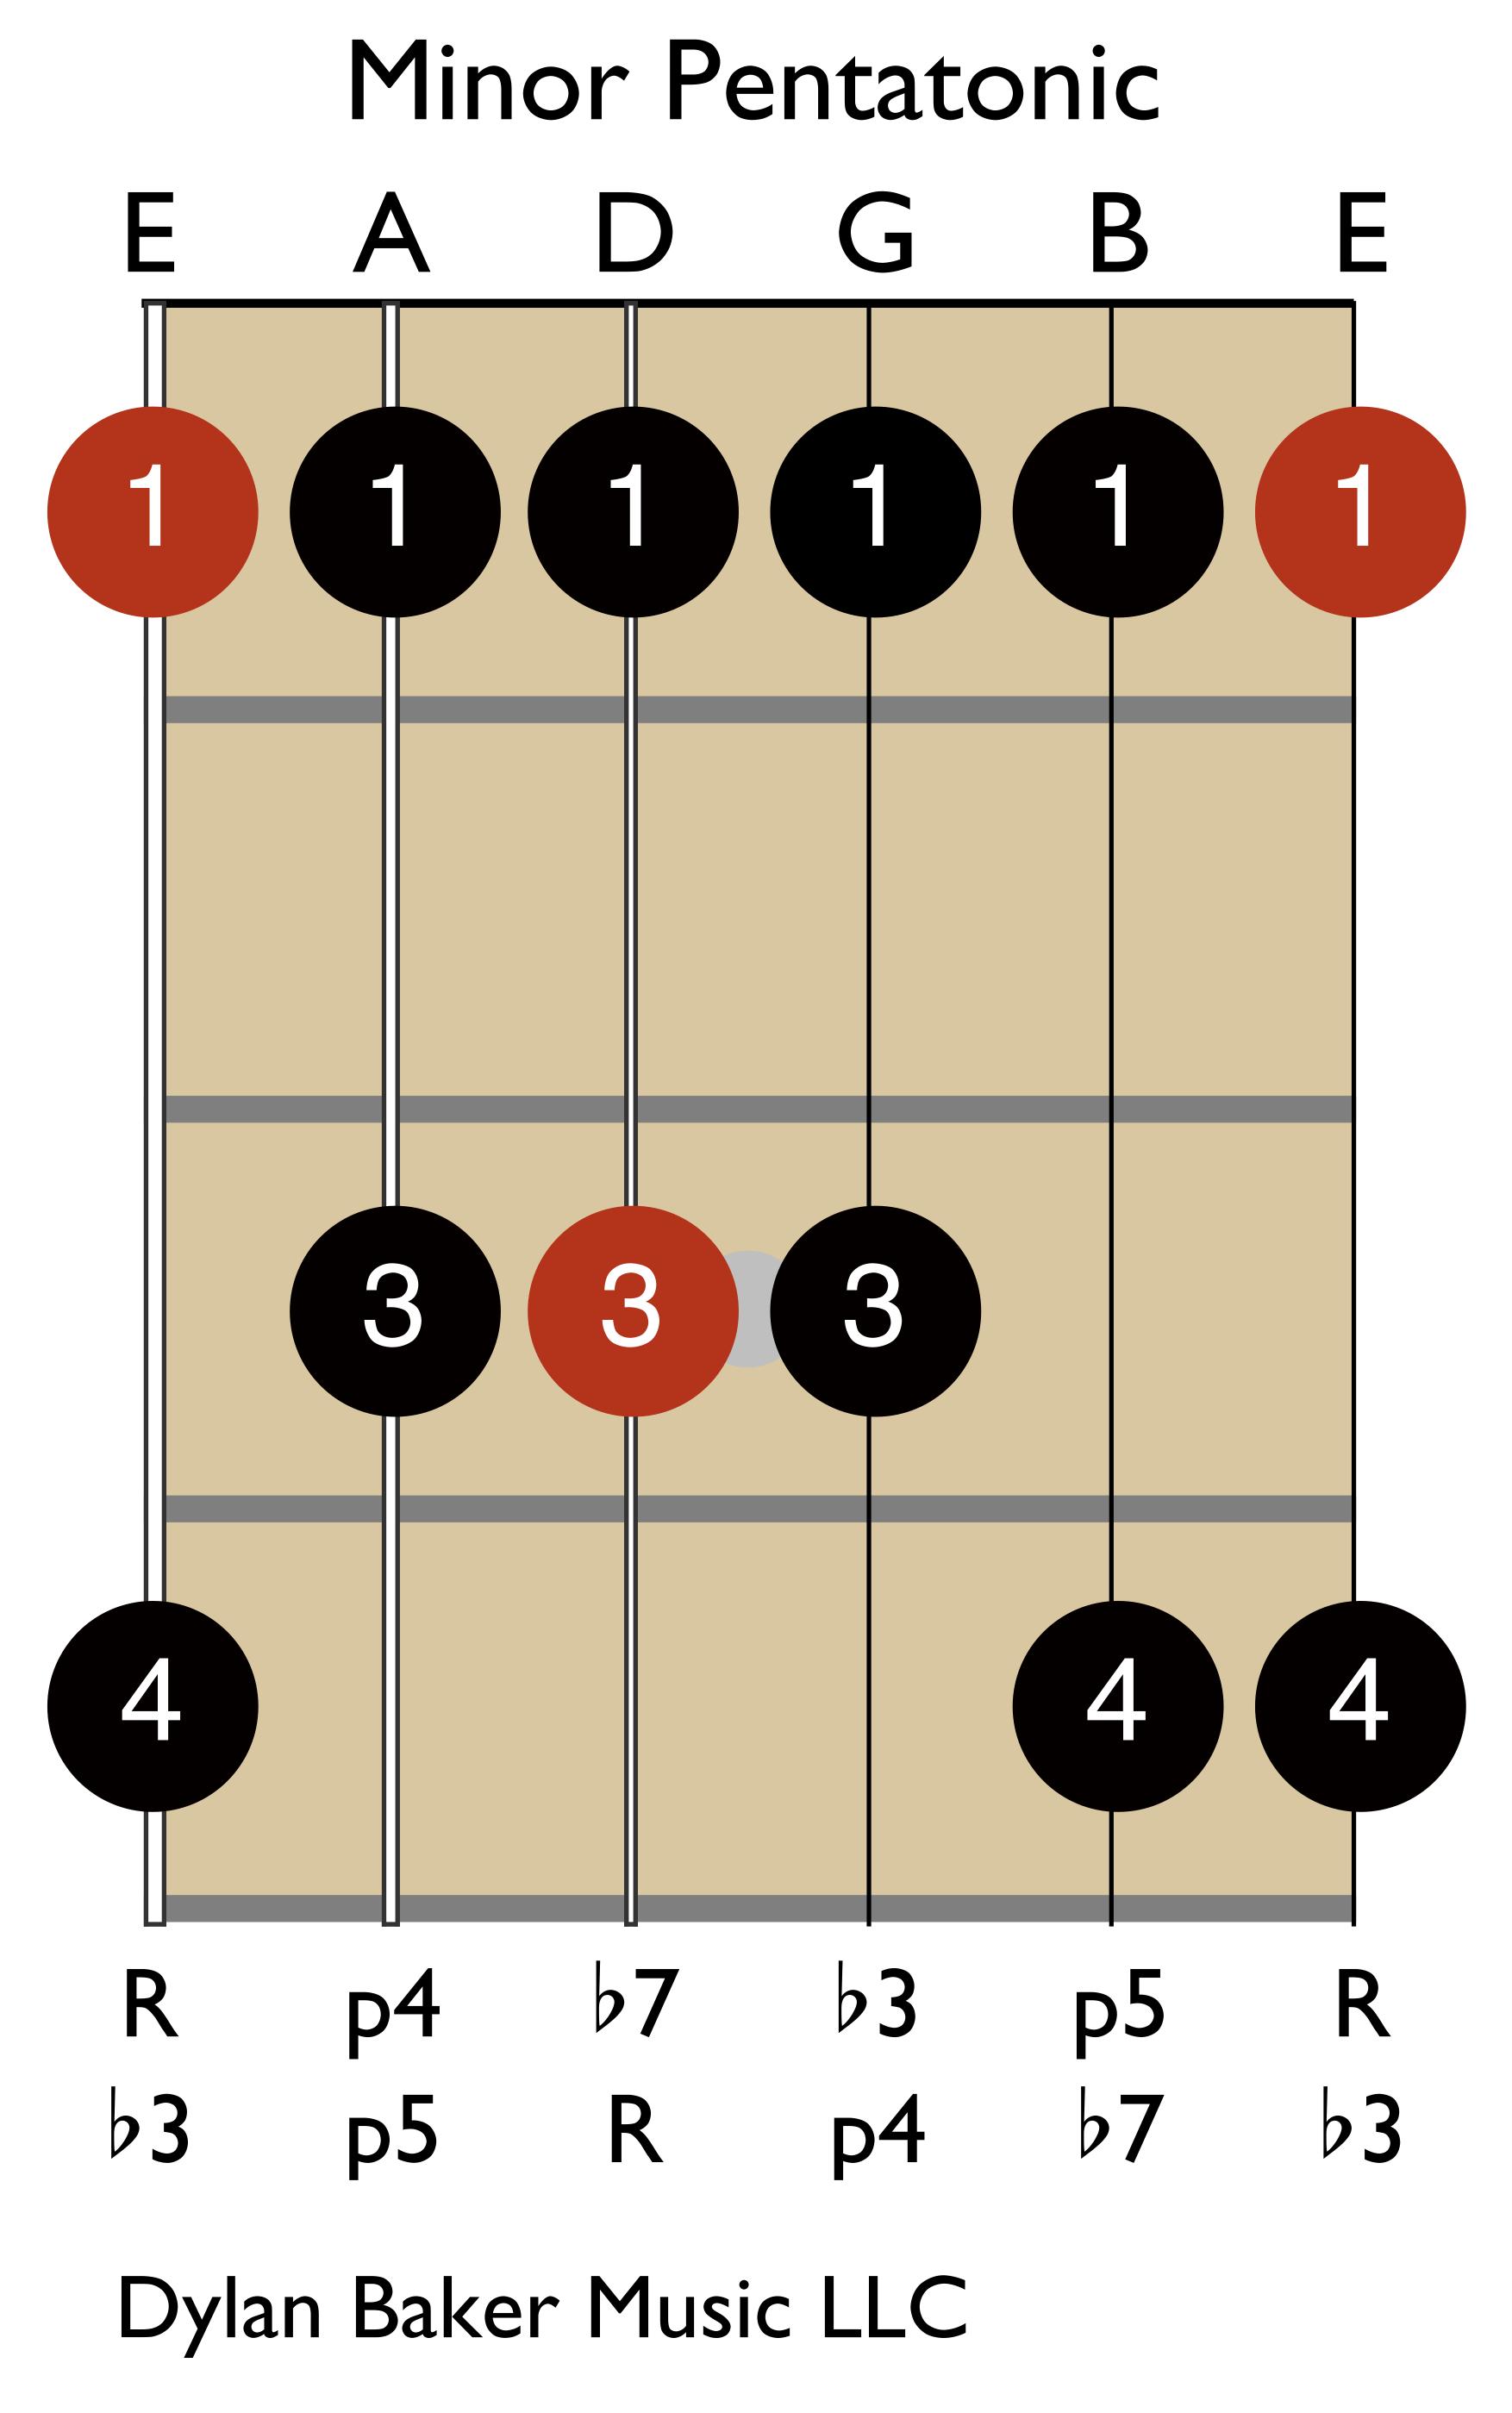 Minor Pentatonic Scale: R, b3, 4, 5, b7